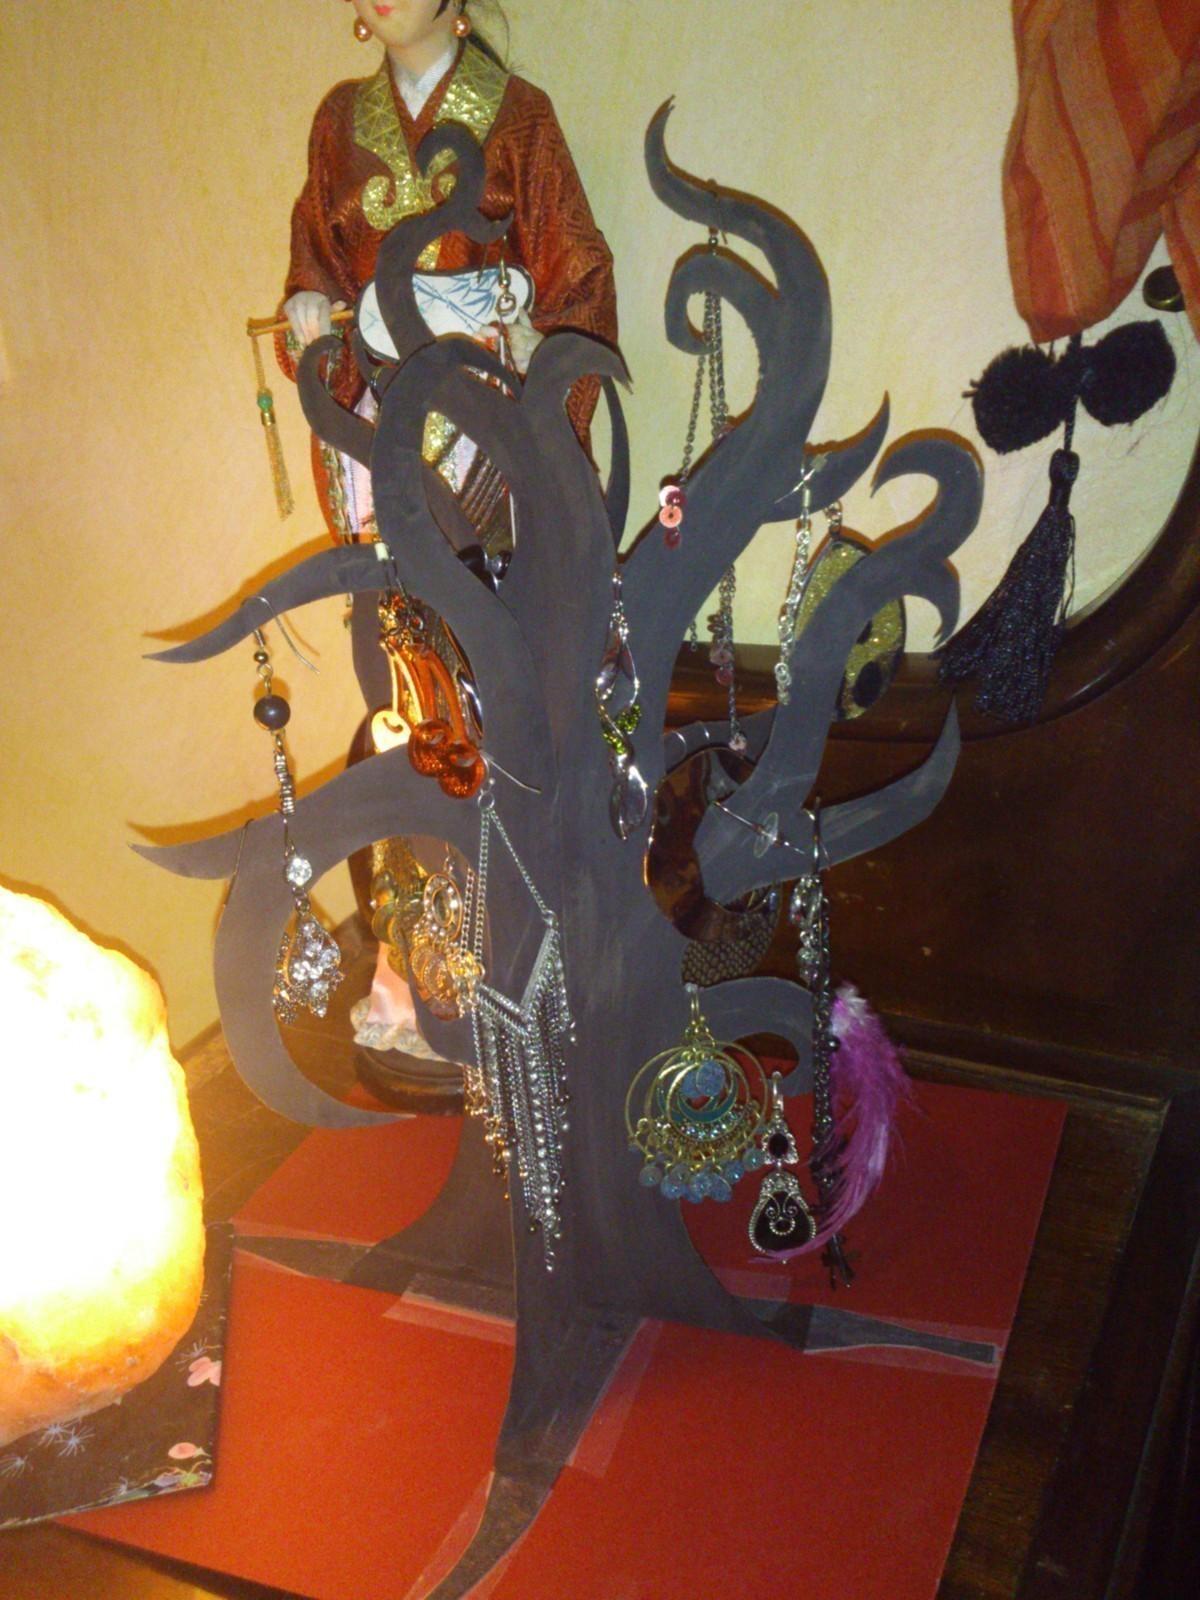 Alice In Wonderland Jewelry Tree 183 A Jewelry Tree 183 Version By Coffeeeri